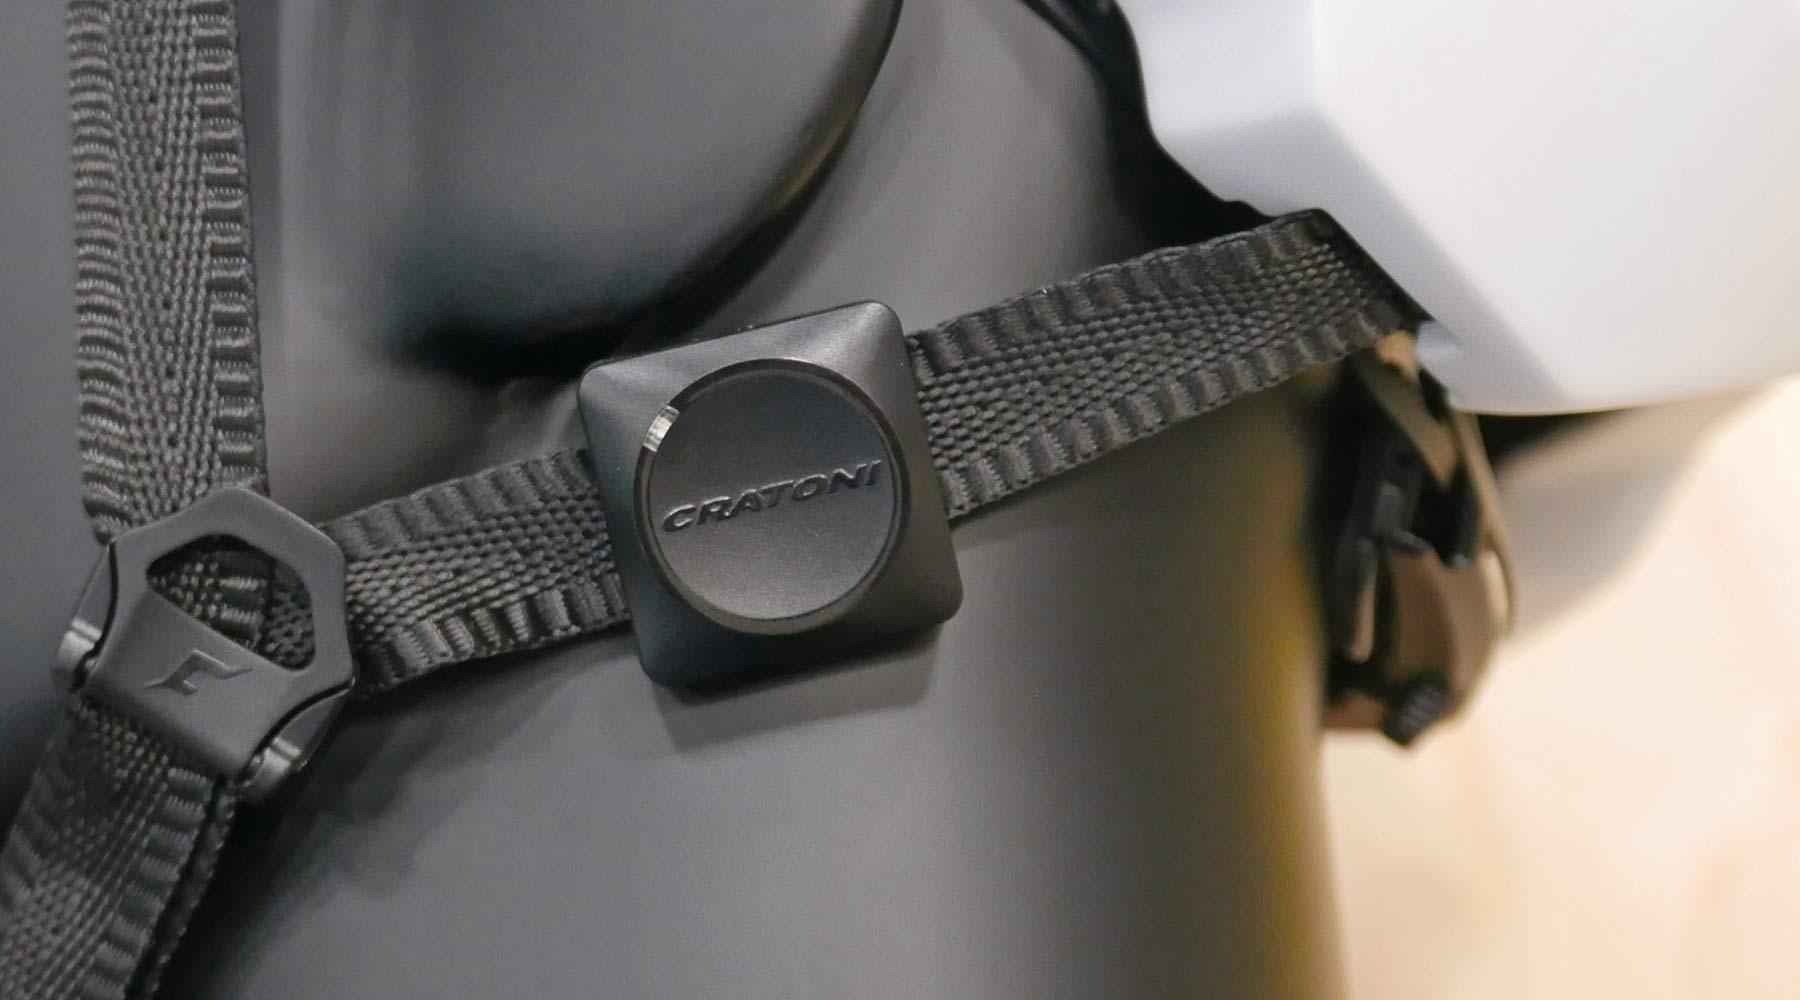 Cratoni C-Safe crash sensor, add-on impact detection safety upgrade for any helmet,strap=on